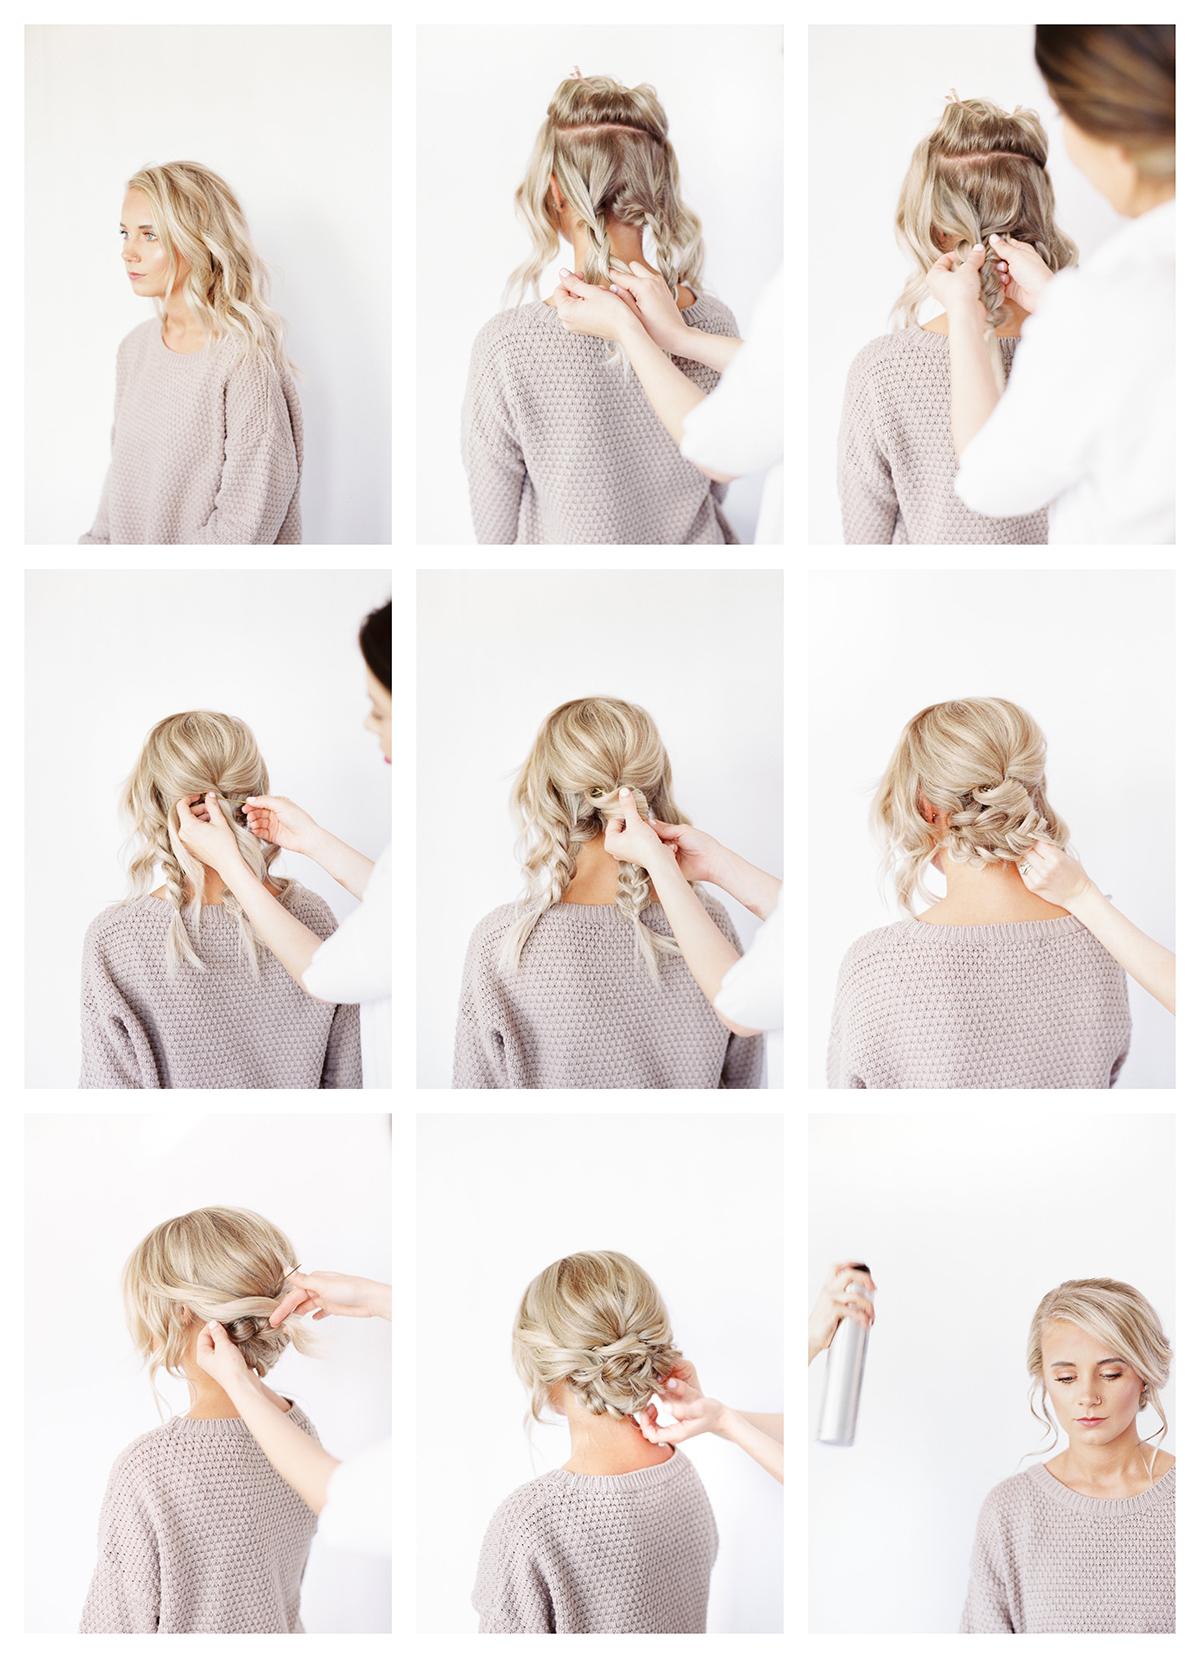 romantic braided updo wedding bridal hairstyle tutorial DIY // braid elegant hair www.hannahforsberg.com-atlanta-wedding-photographer-hair-makeup-tutorial-diy-romantic-updo-collage.jpg